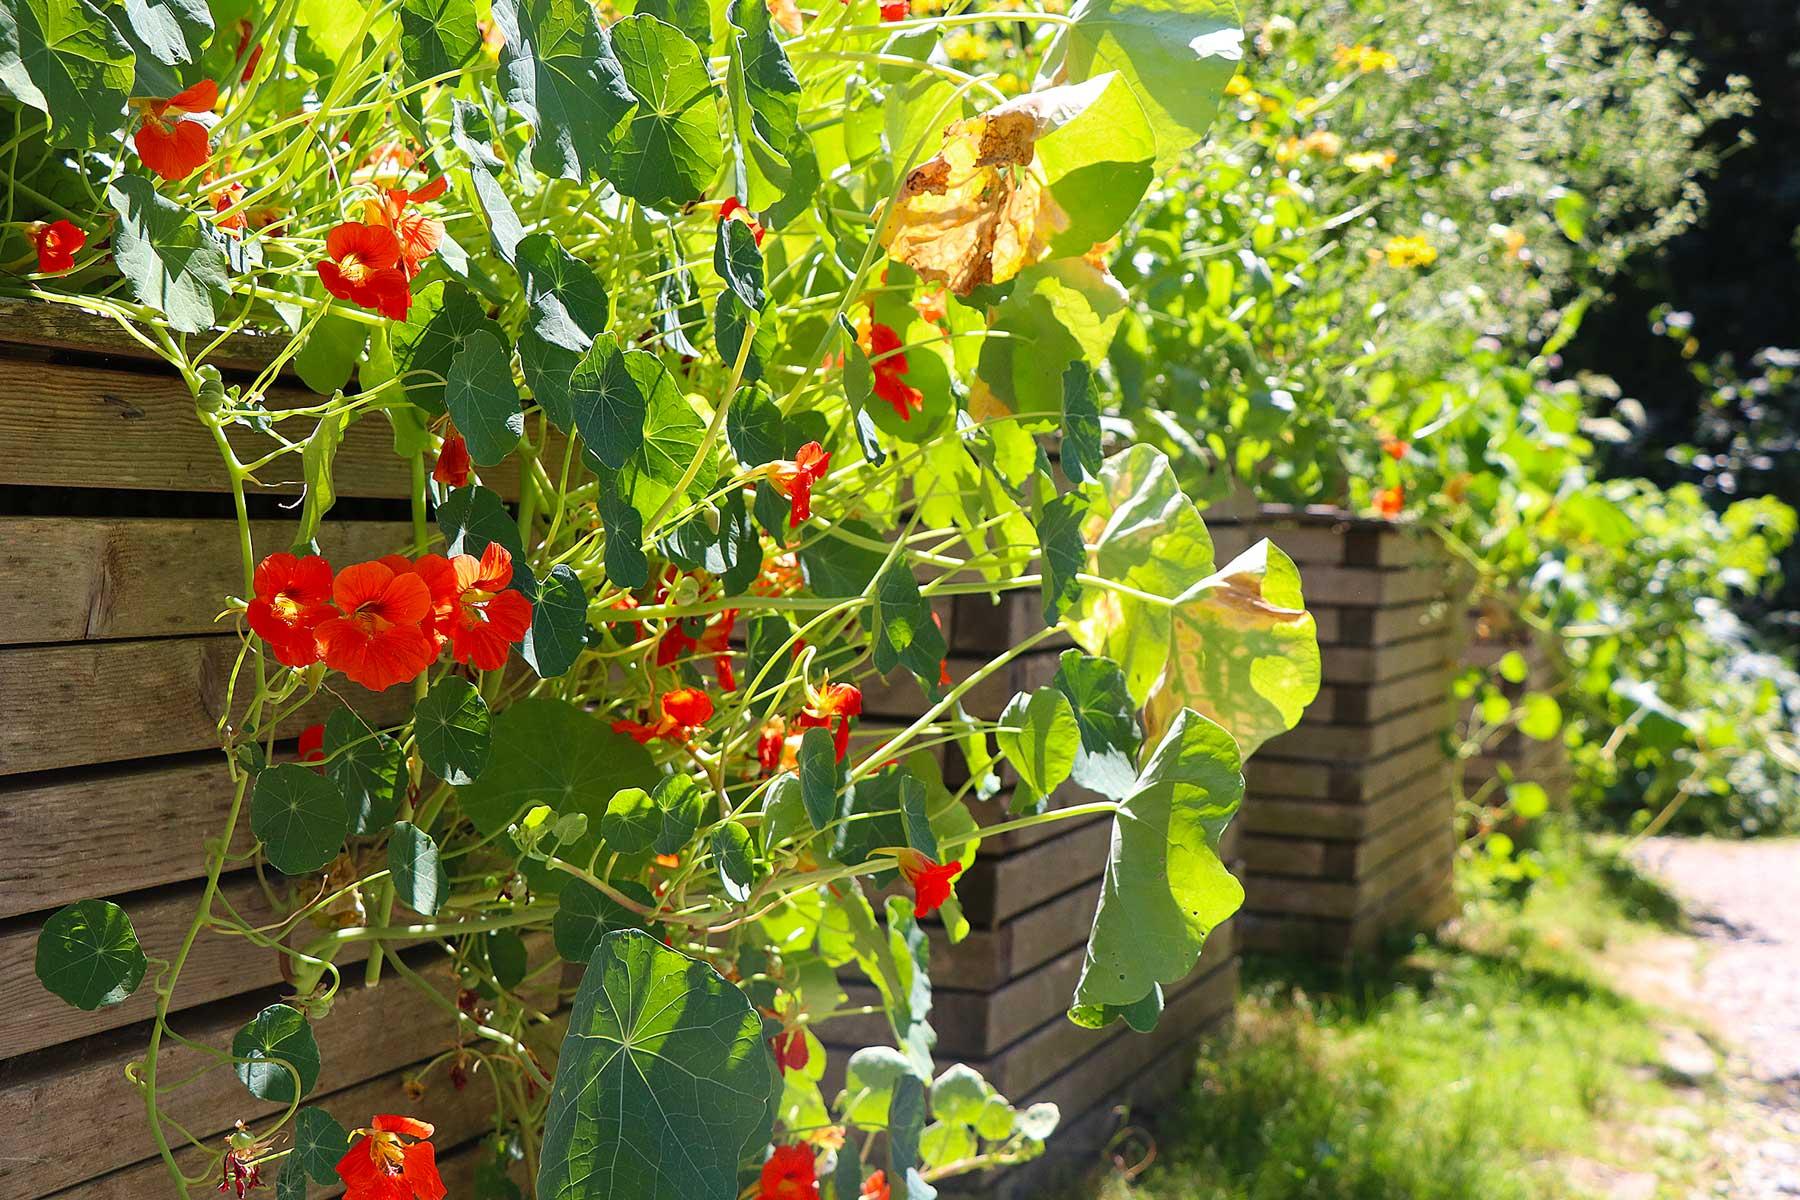 Gartenführung: Grüne Ecken, bunte Beete